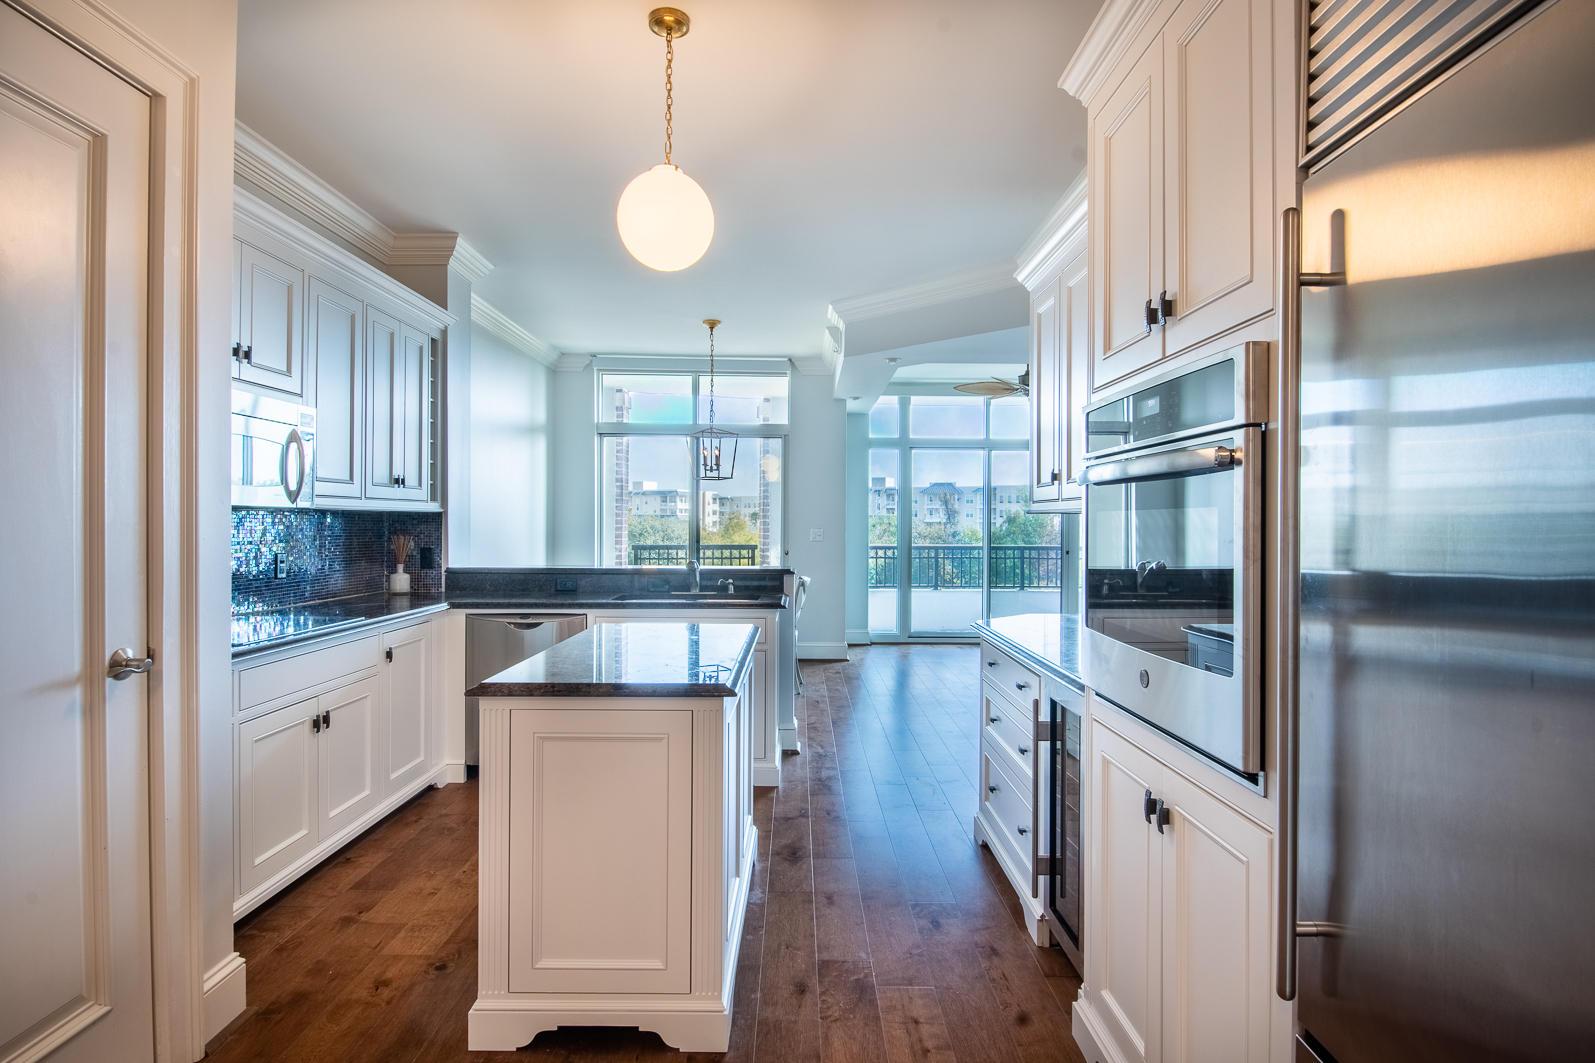 Renaissance On Chas Harbor Homes For Sale - 144 Plaza, Mount Pleasant, SC - 30